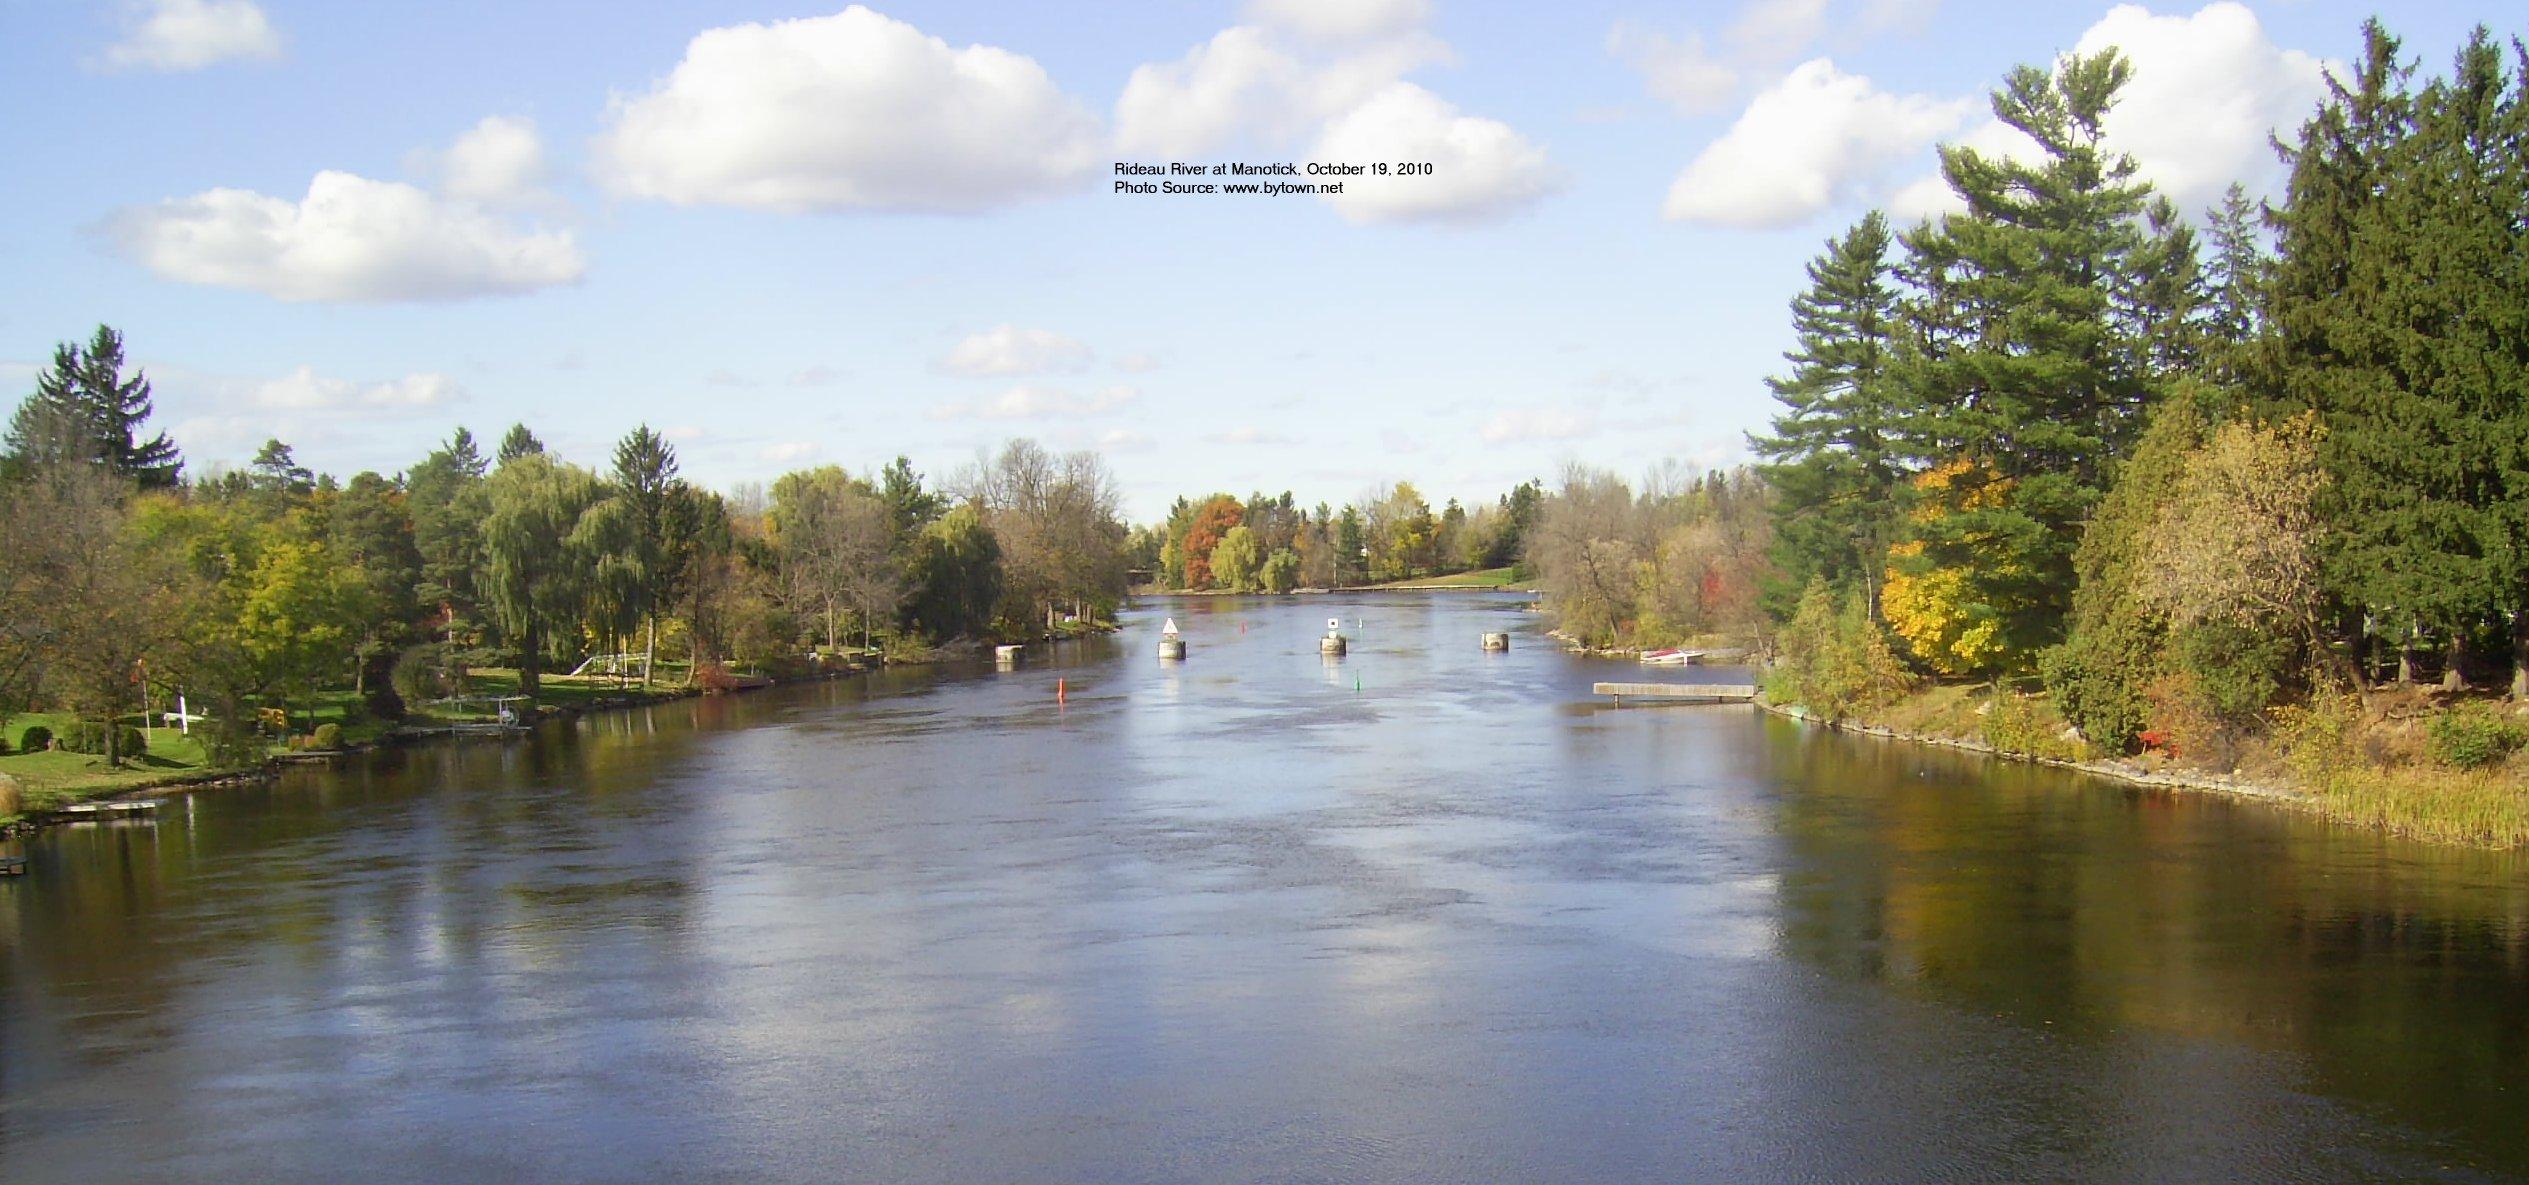 Rideau River at Manotick, Ontario, Canada